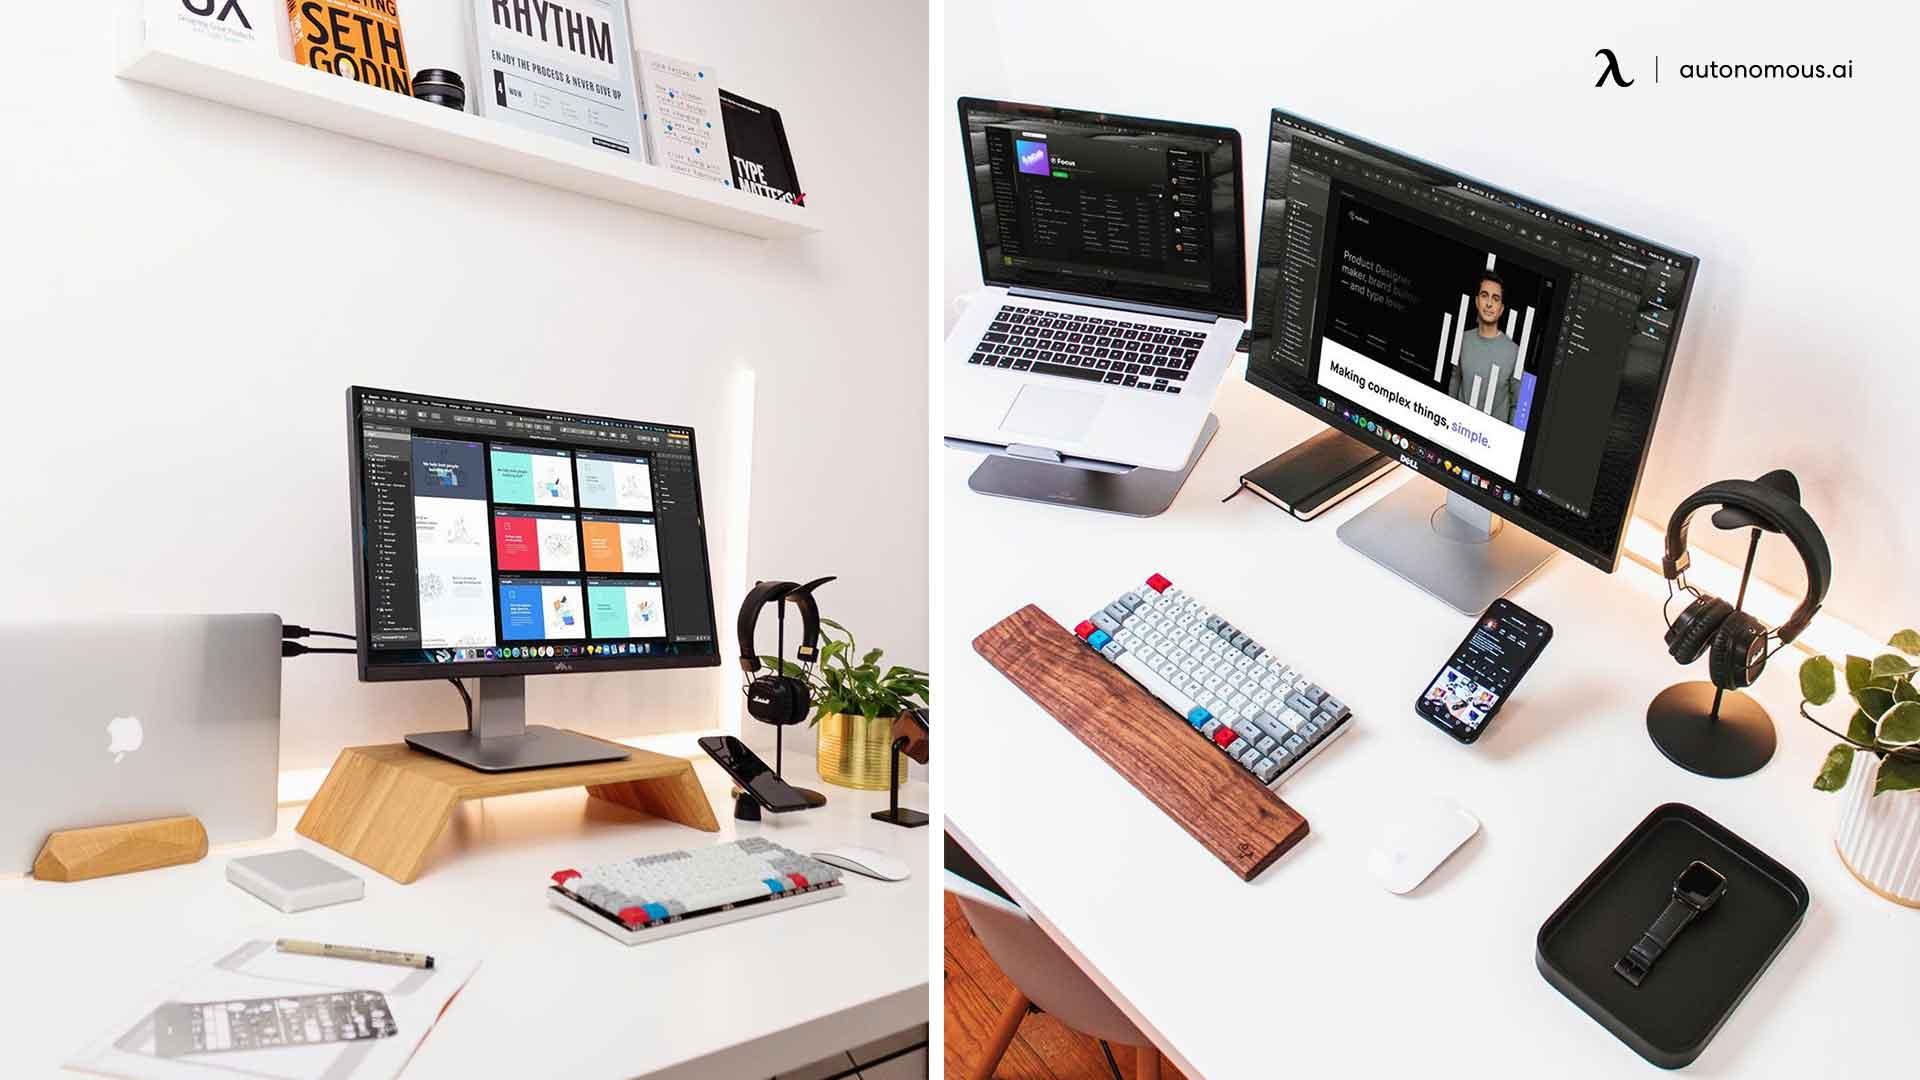 new setup - devices